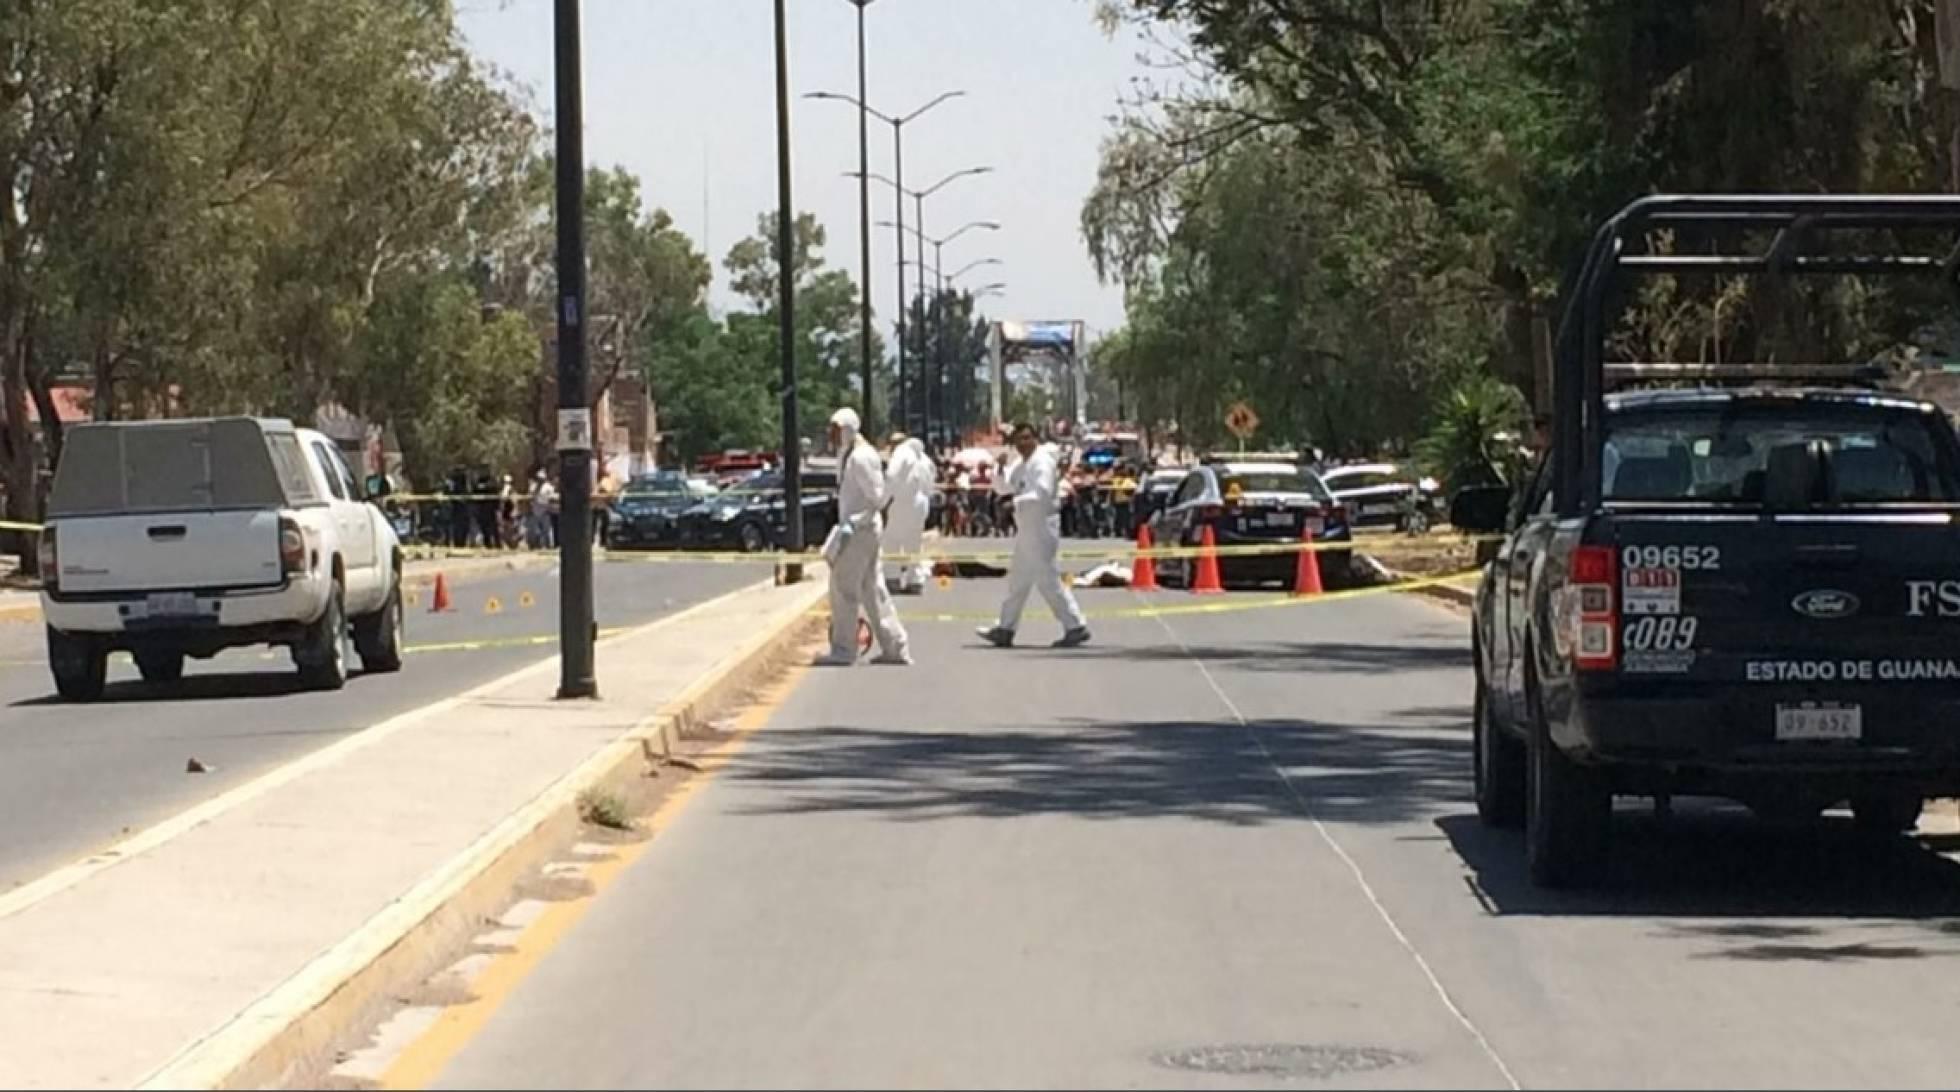 Seis policías asesinados a balazos en plena calle en el Estado mexicano de Guanajuato